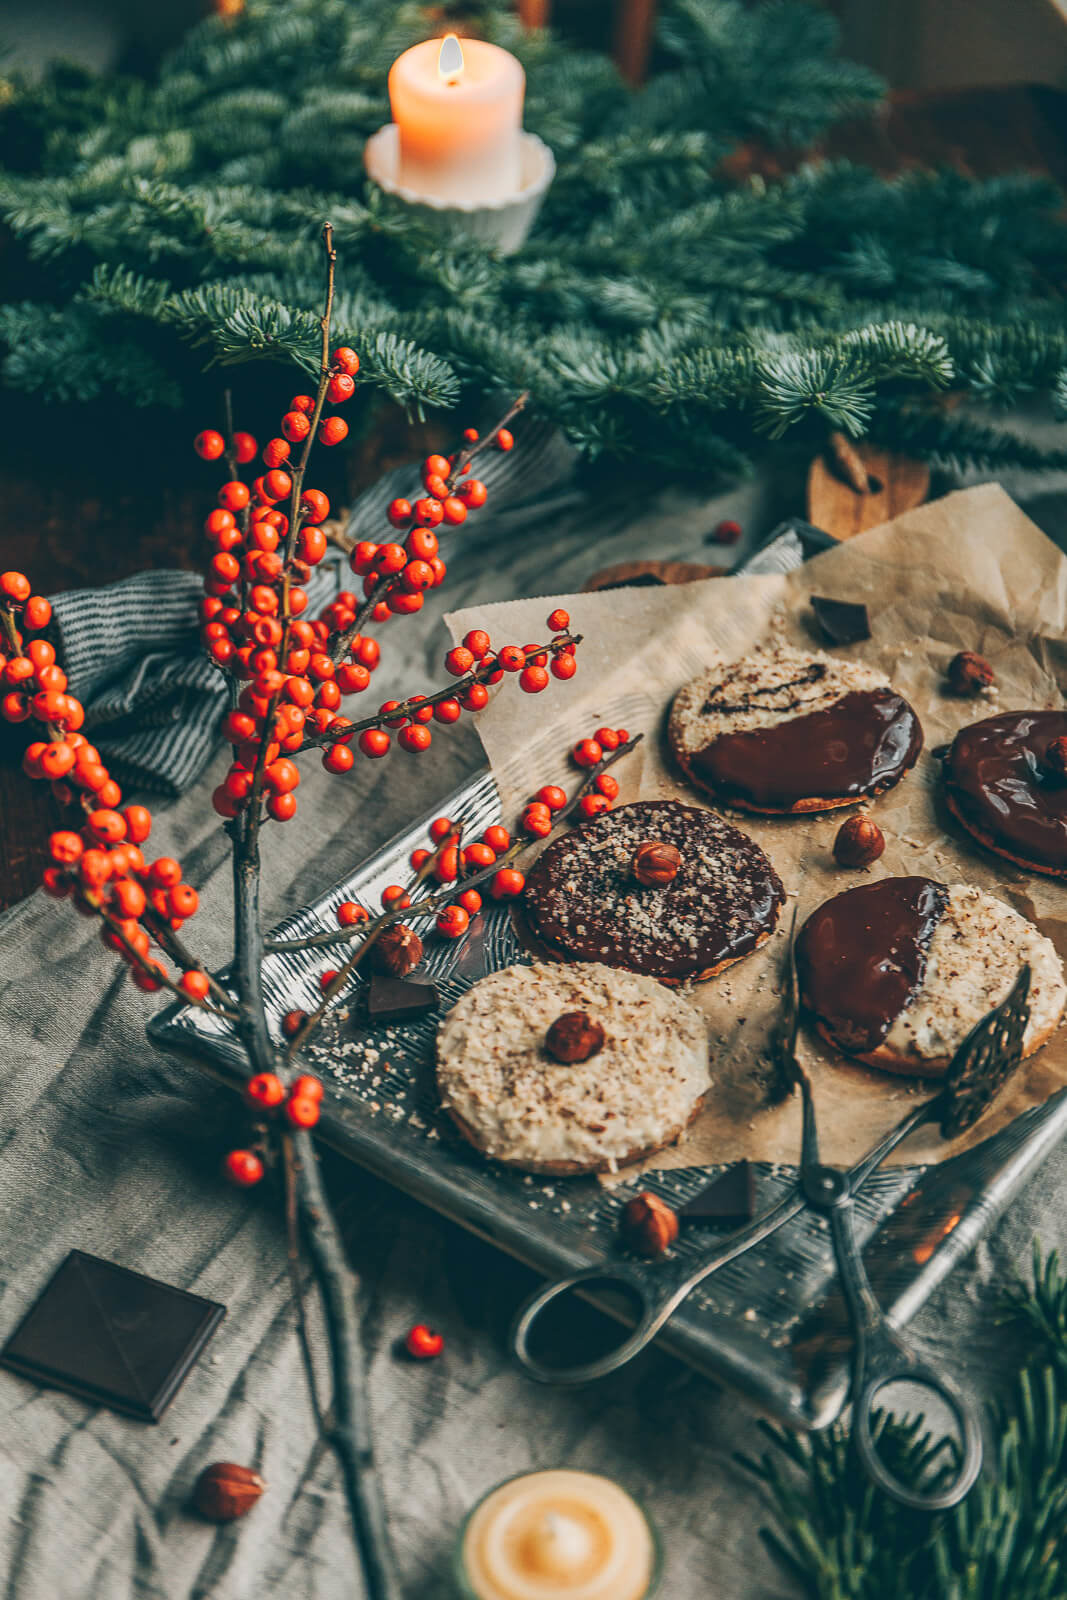 Spekulatiuskekse mit Haselnüssen, Spekulatiuskekse, Weihnachtskekse vegan, vegane Weihnachtsbäckerei, Vergabe Kekse Rezept, Rezept vegan Weihnachtskekse, Kekse Weihnachten Rezept vegan, vegane Cookies, Cookies mit Haselnüssen vegan, Spekulatius-Kekse